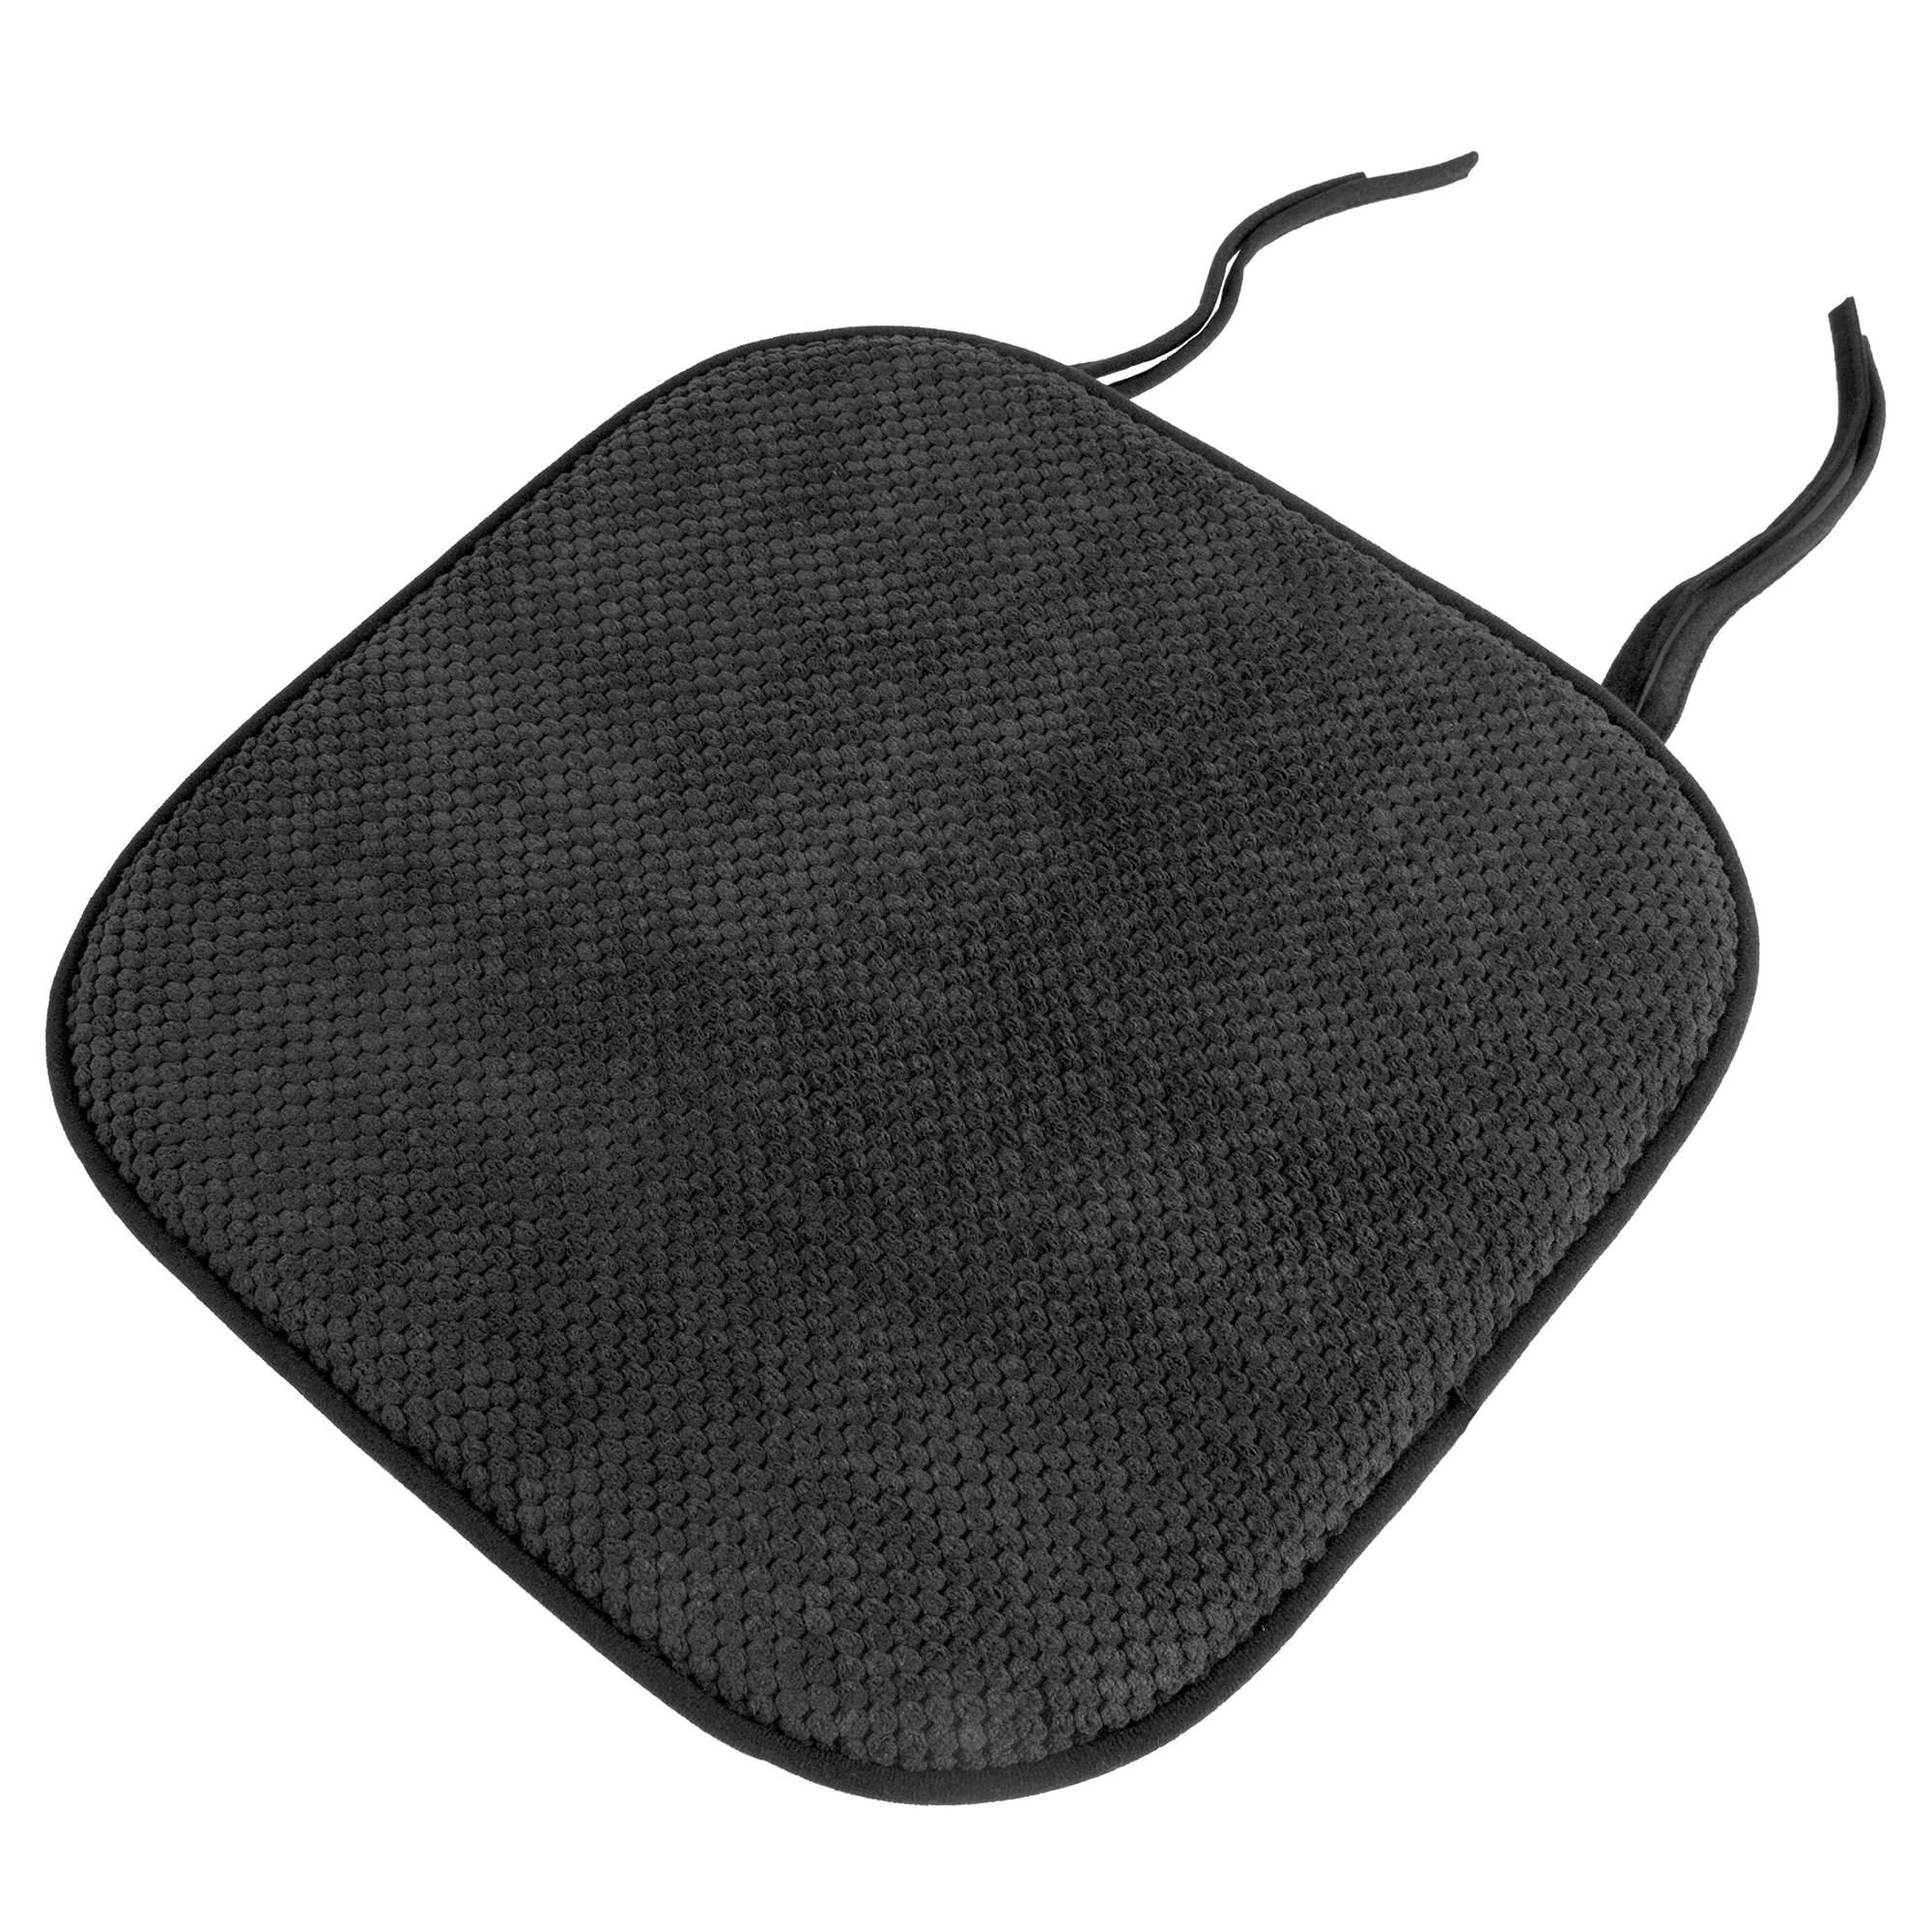 chair cushion foam drive transport parts memory wayfair quickview